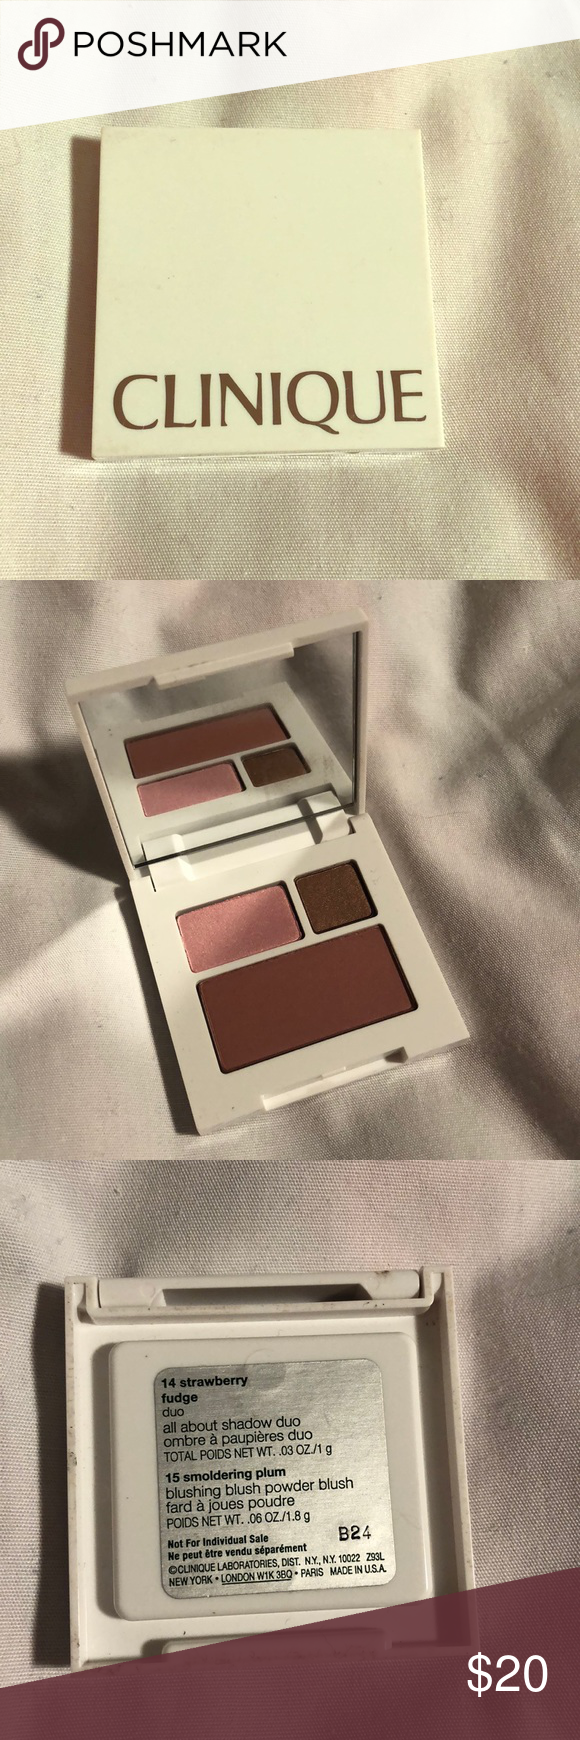 Clinique eyeshadow and blush palette Strawberry fudge duo, smoldering plum blush Clinique Makeup